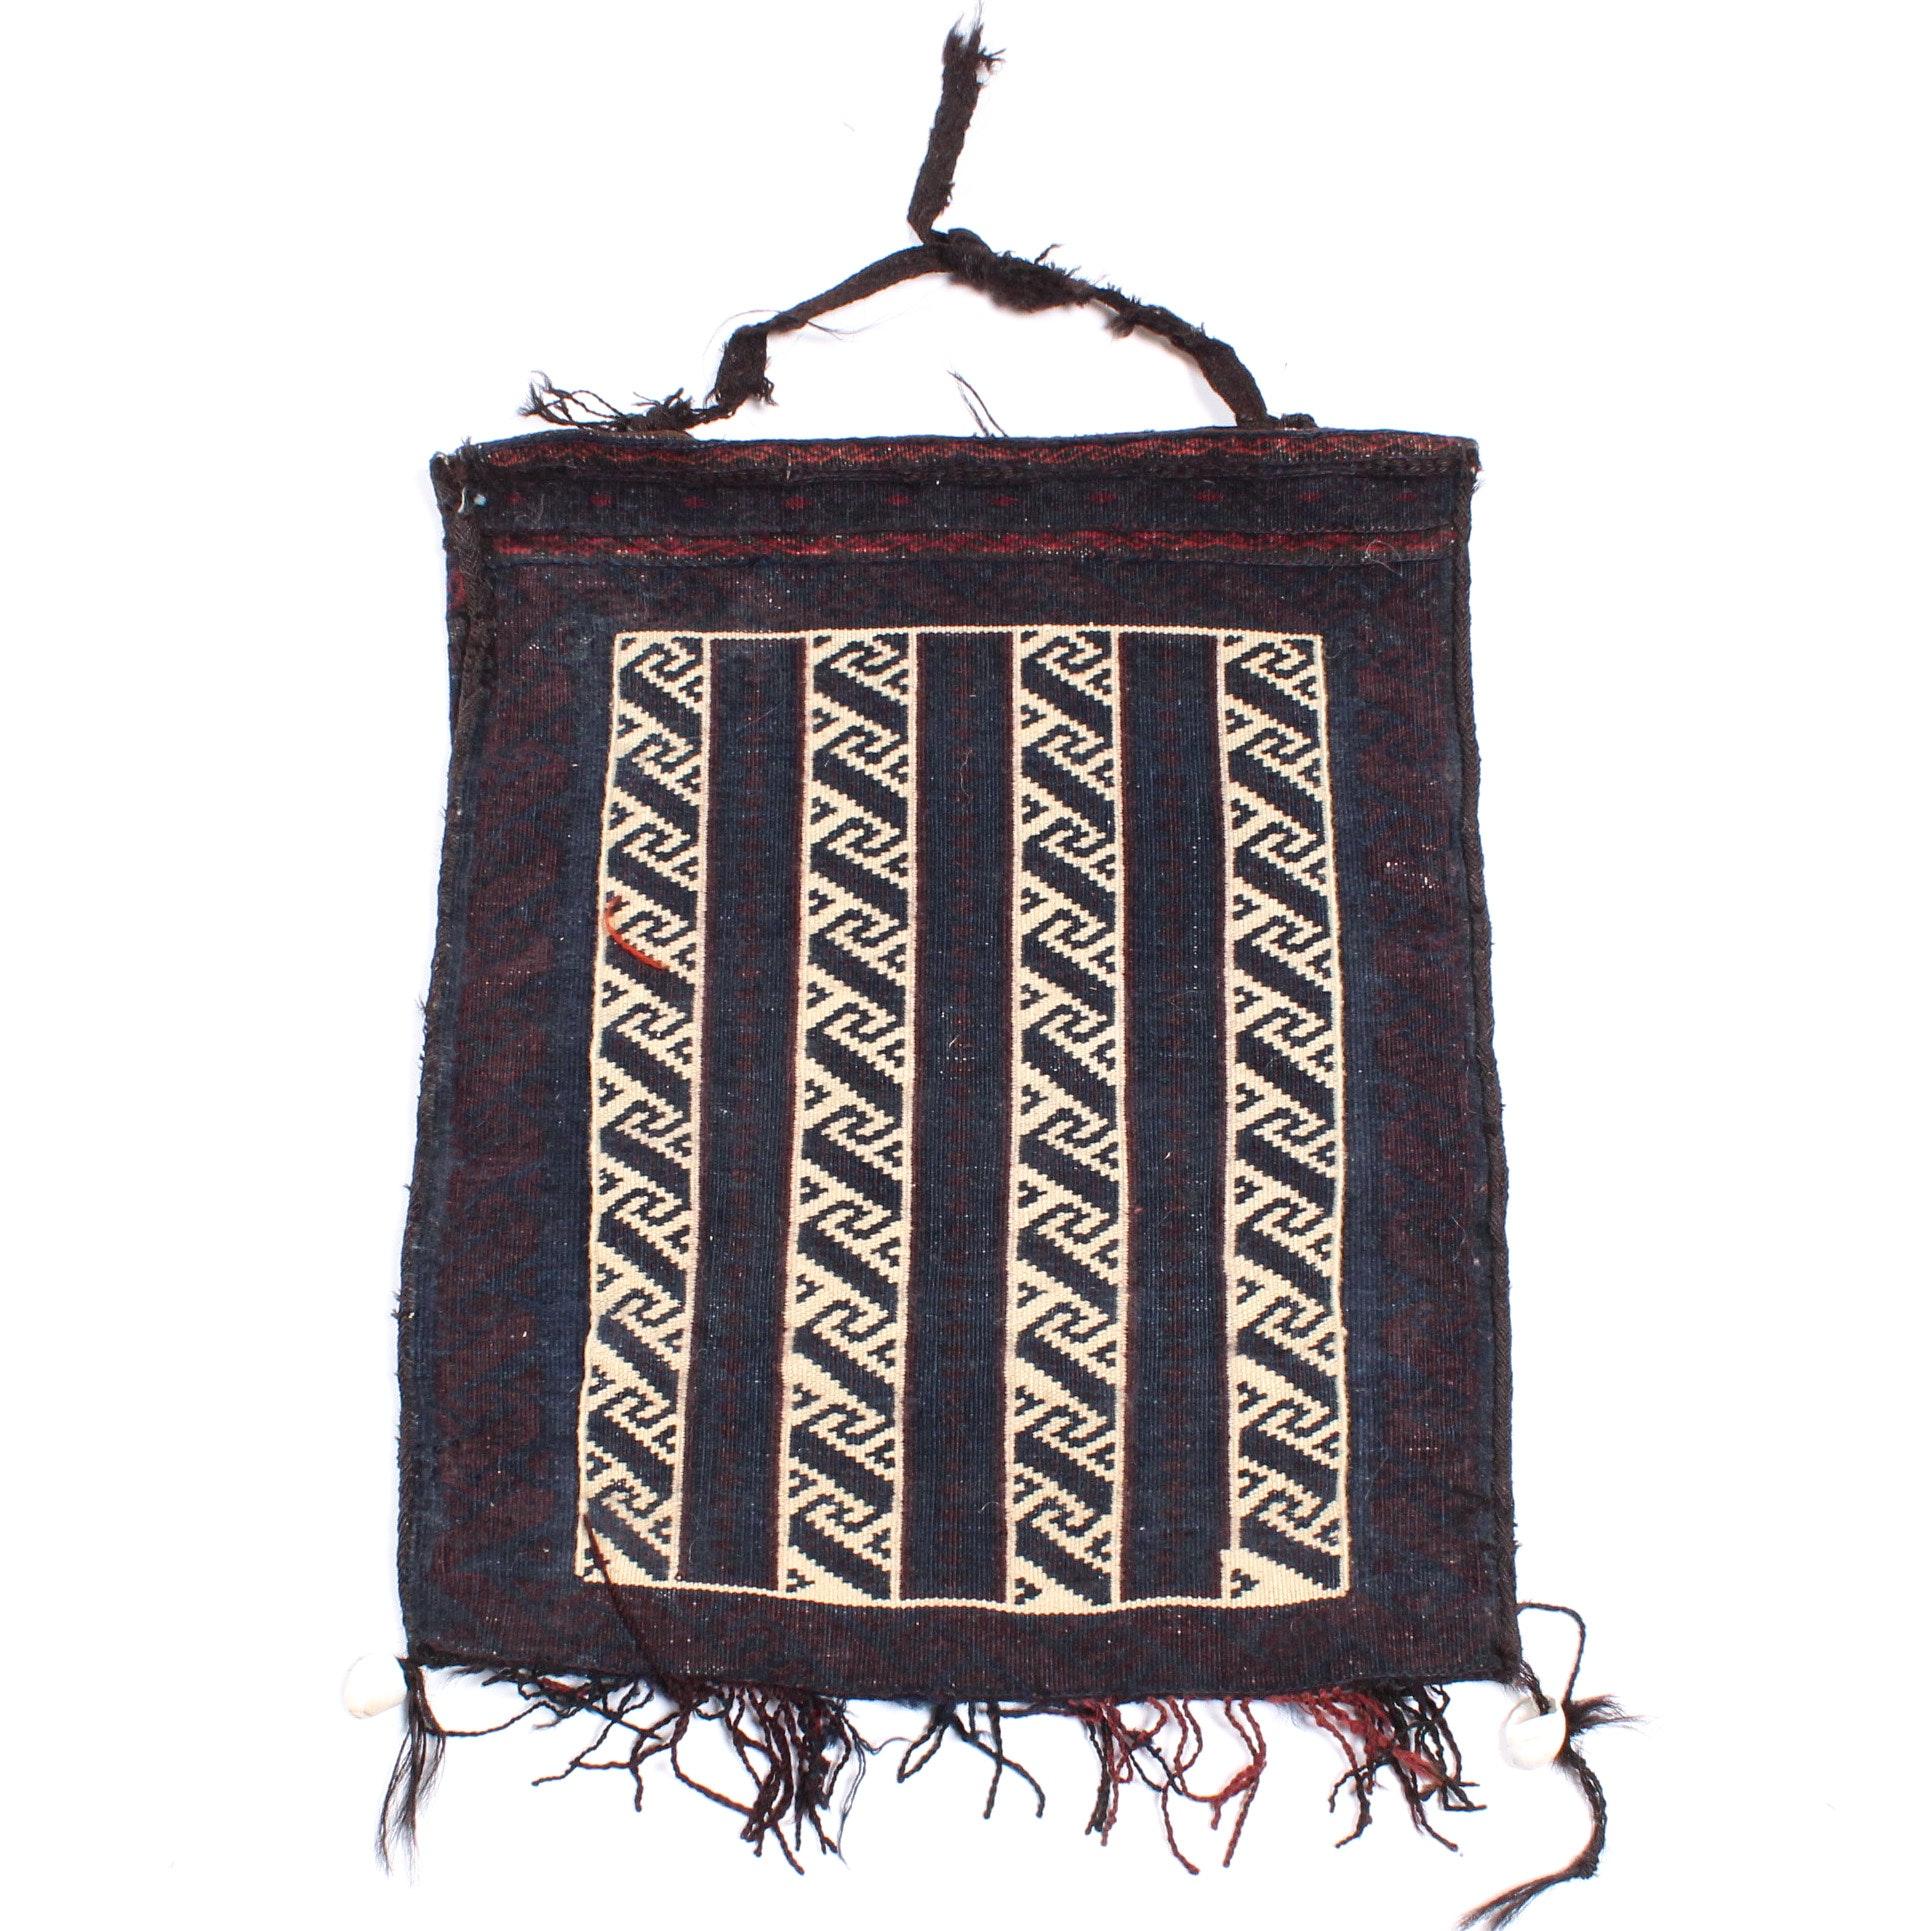 Handwoven Persian Baluch Chanteh Storage Bag